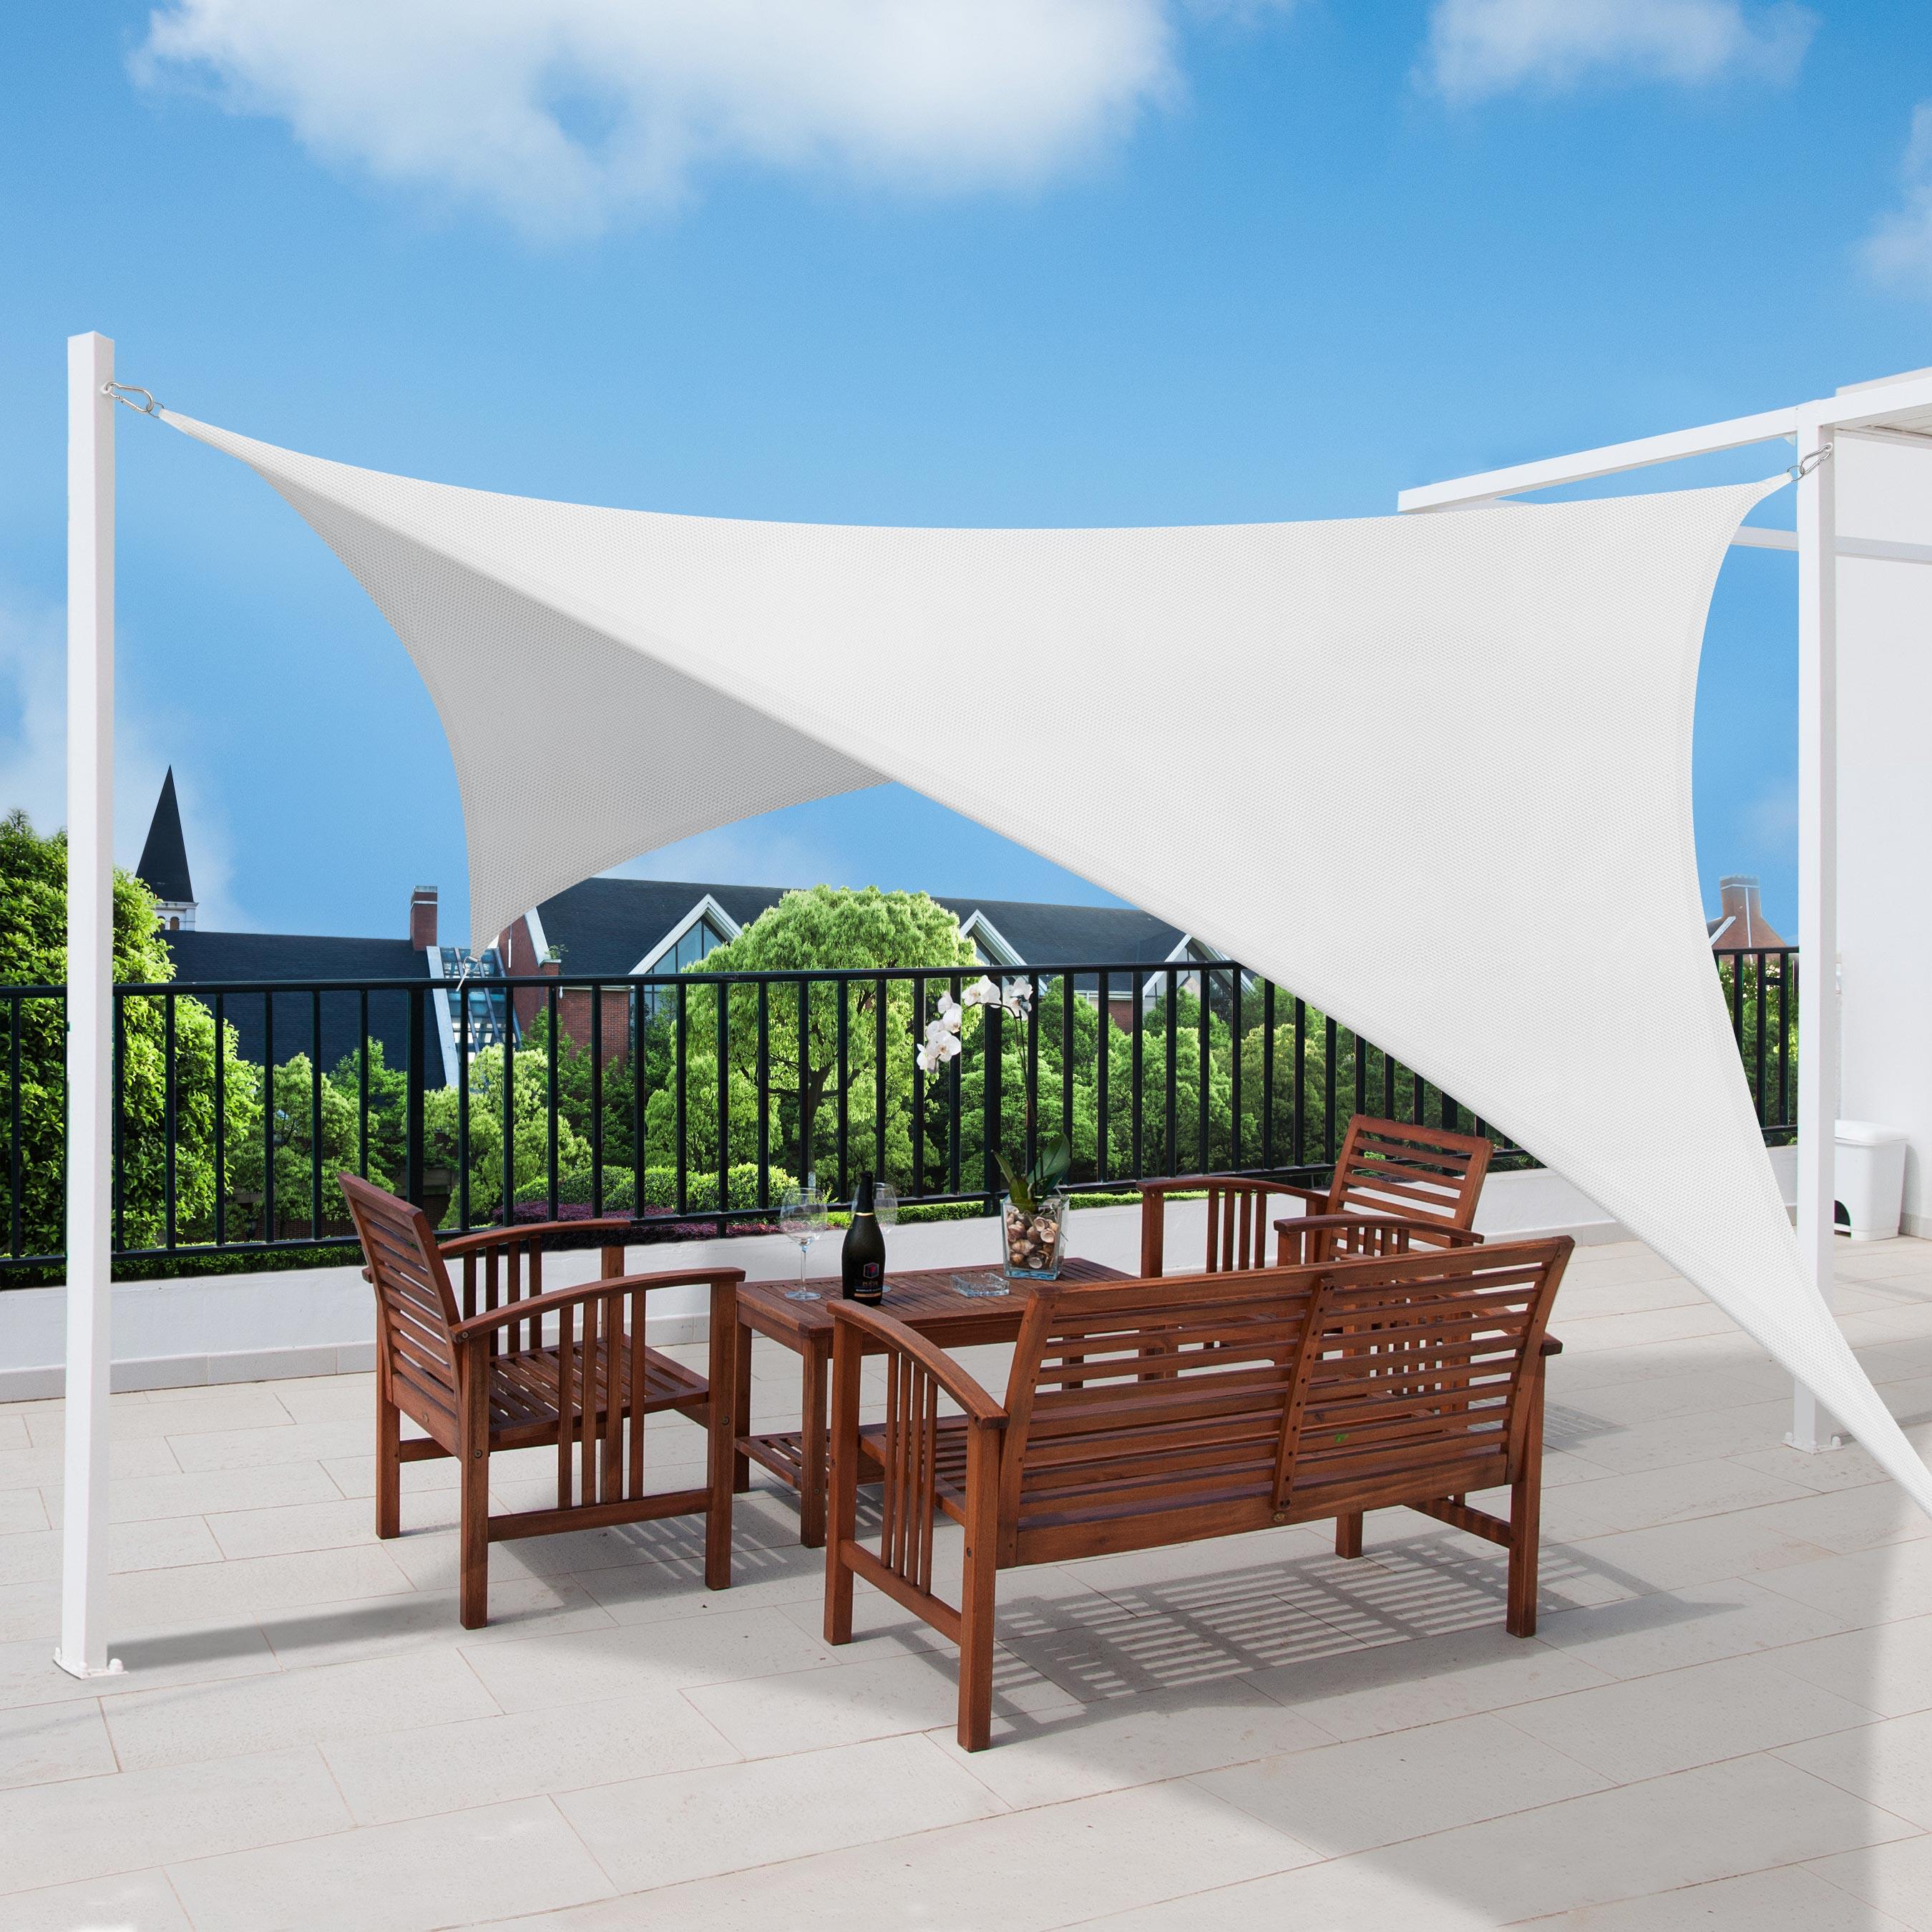 sonnensegel rechteck sonnenschutz rechteckig uv schutz. Black Bedroom Furniture Sets. Home Design Ideas